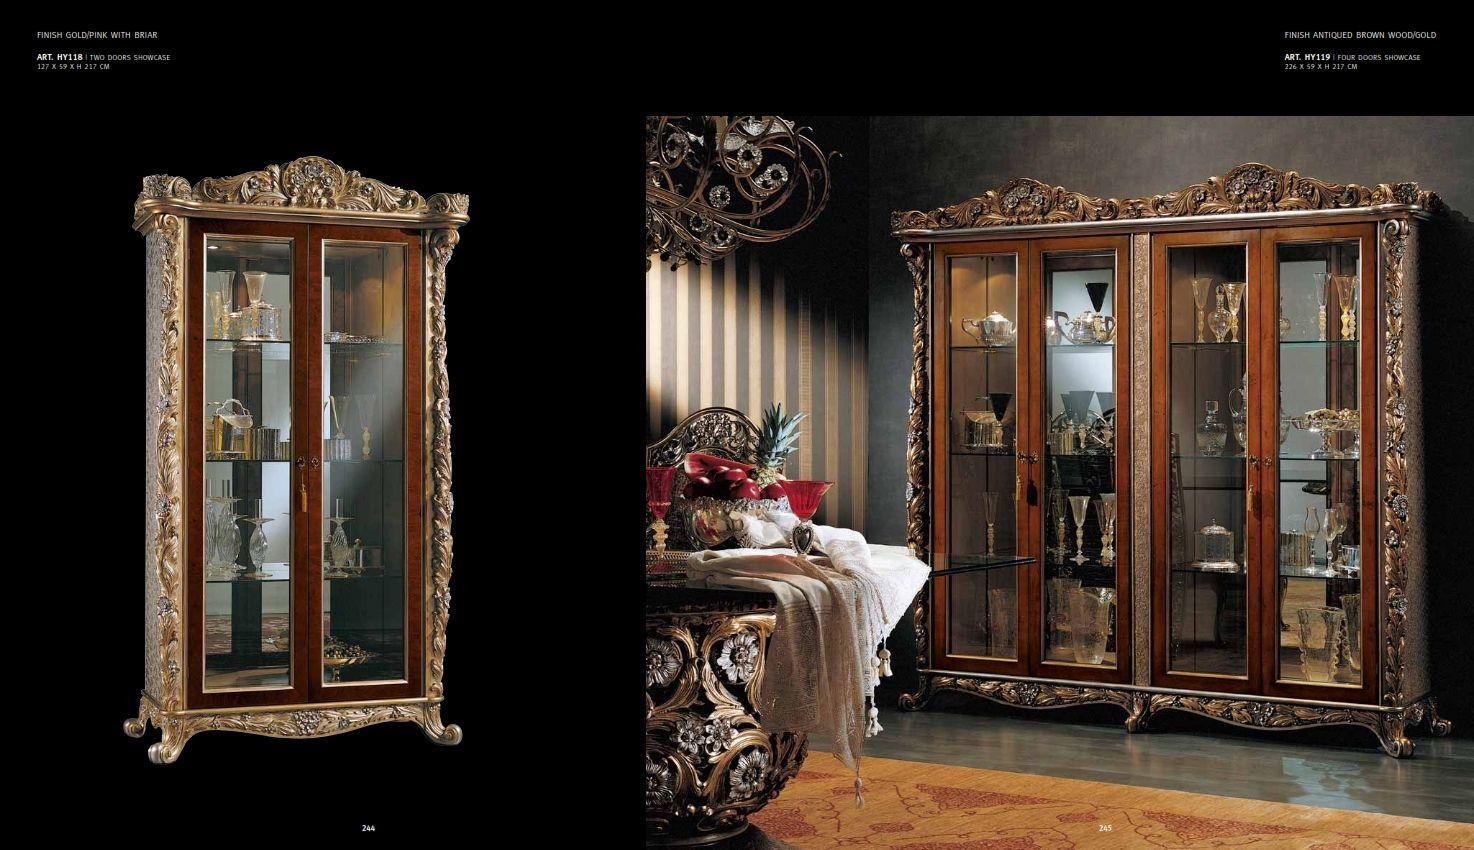 luxus m bel luxus esszimmer serie cappelletti hypnosedie m bel aus italien. Black Bedroom Furniture Sets. Home Design Ideas